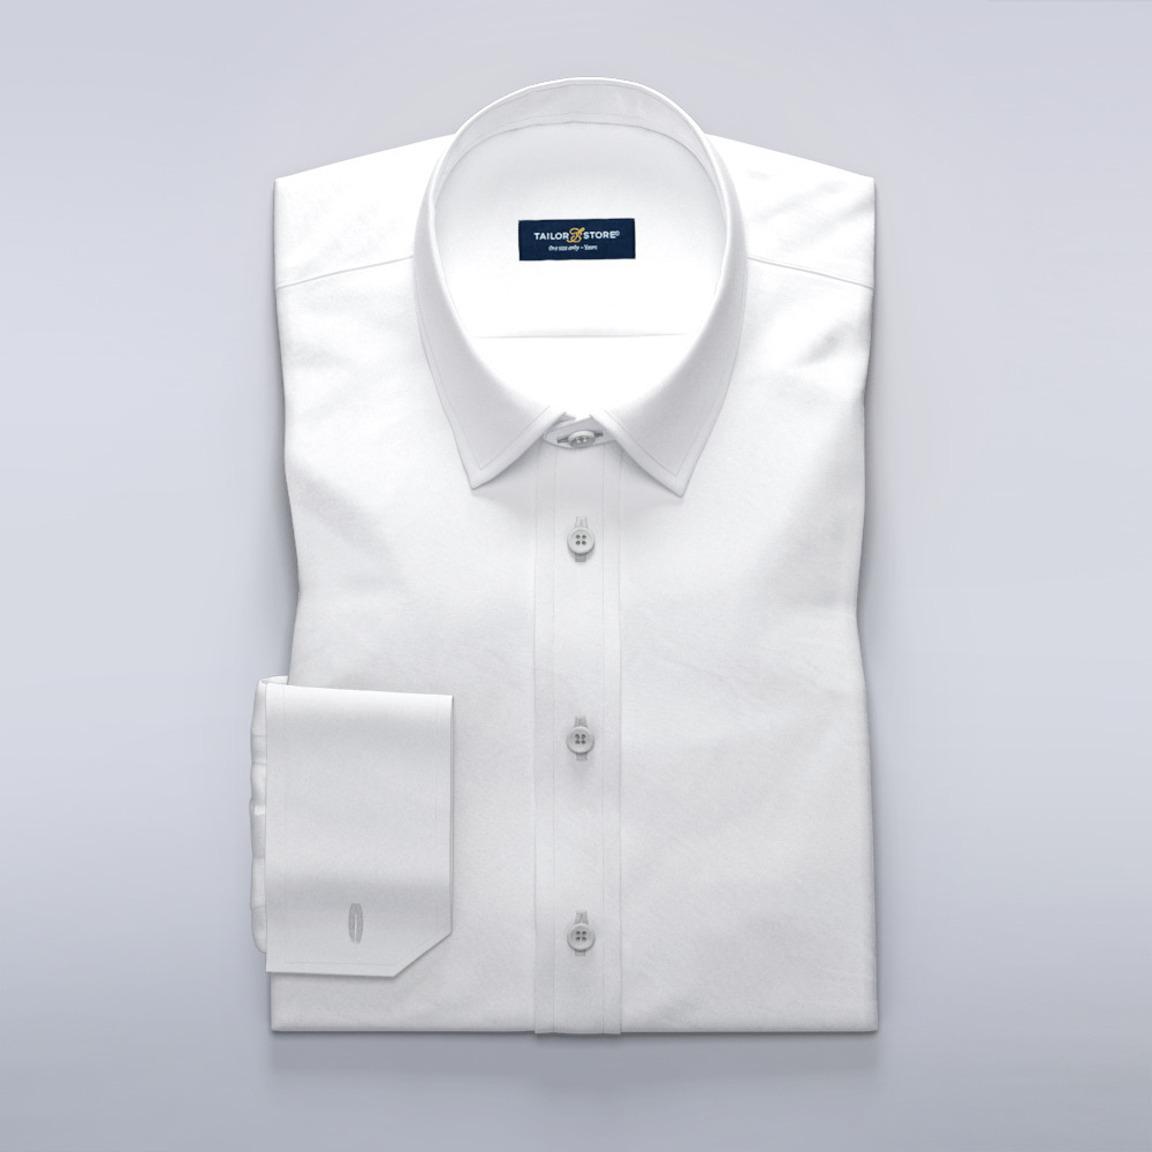 Men's shirt - Islington, white